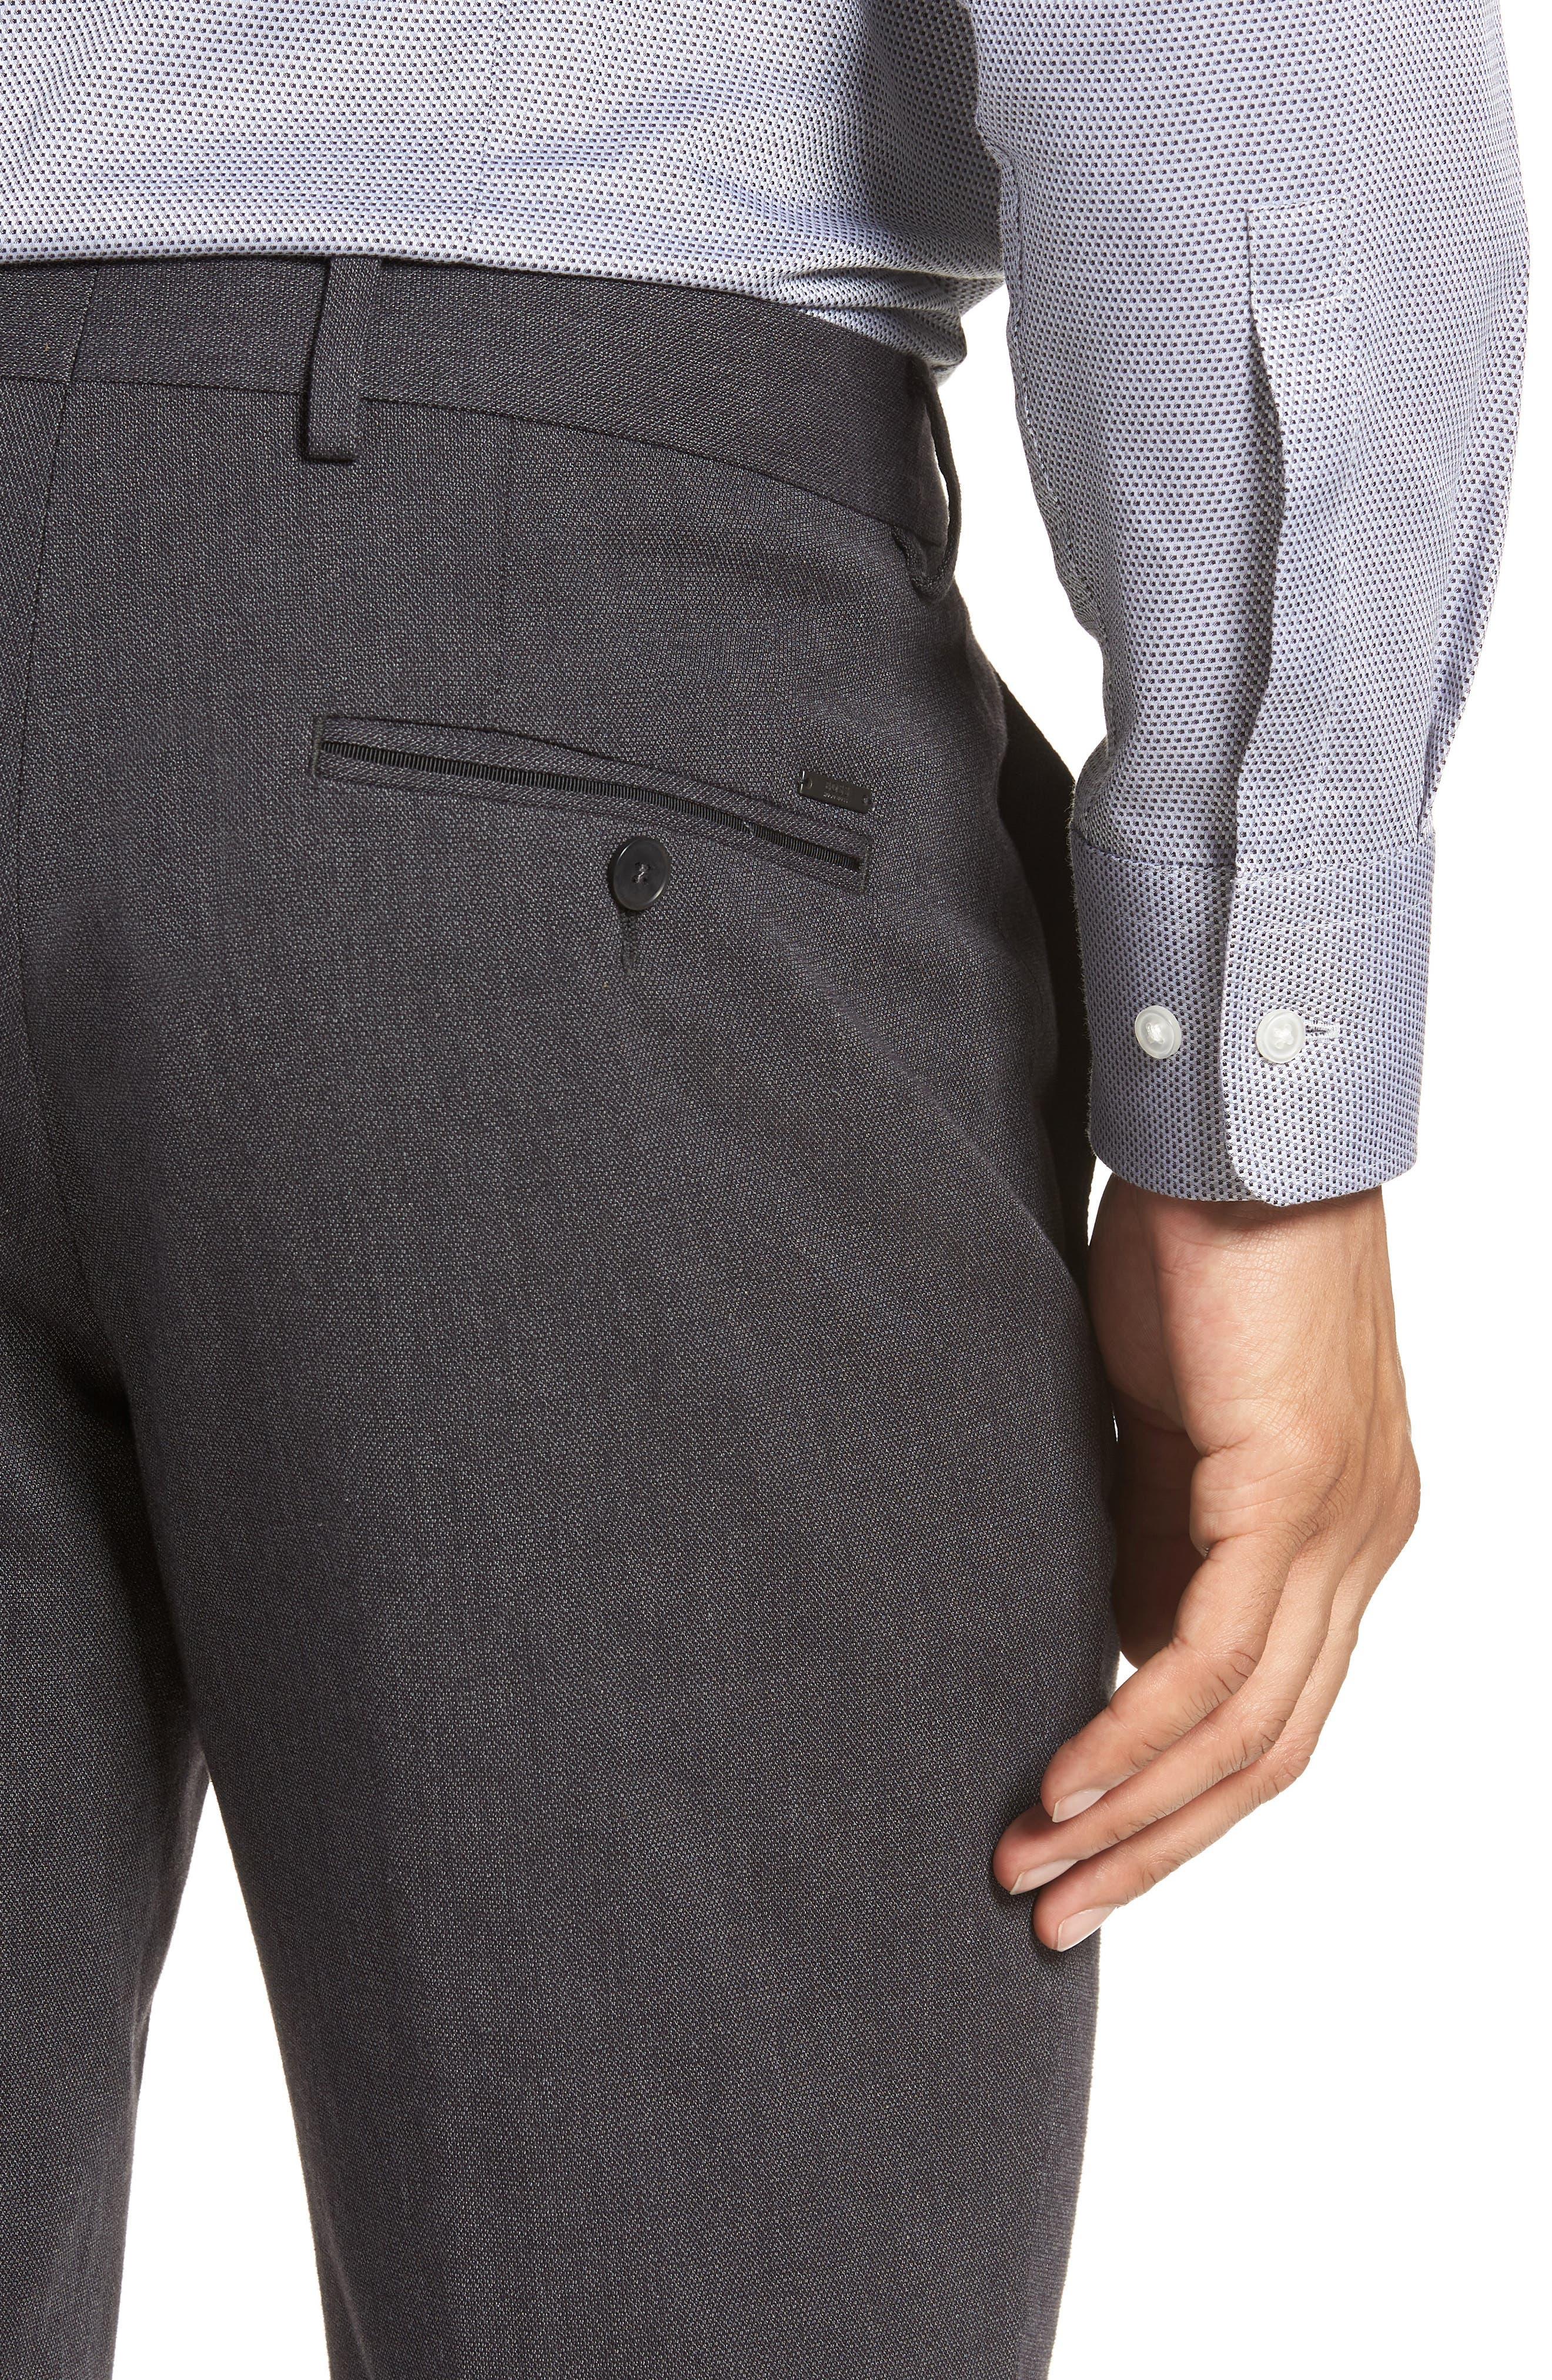 Batho Flat Front Solid Cotton Trousers,                             Alternate thumbnail 4, color,                             MEDIUM GREY